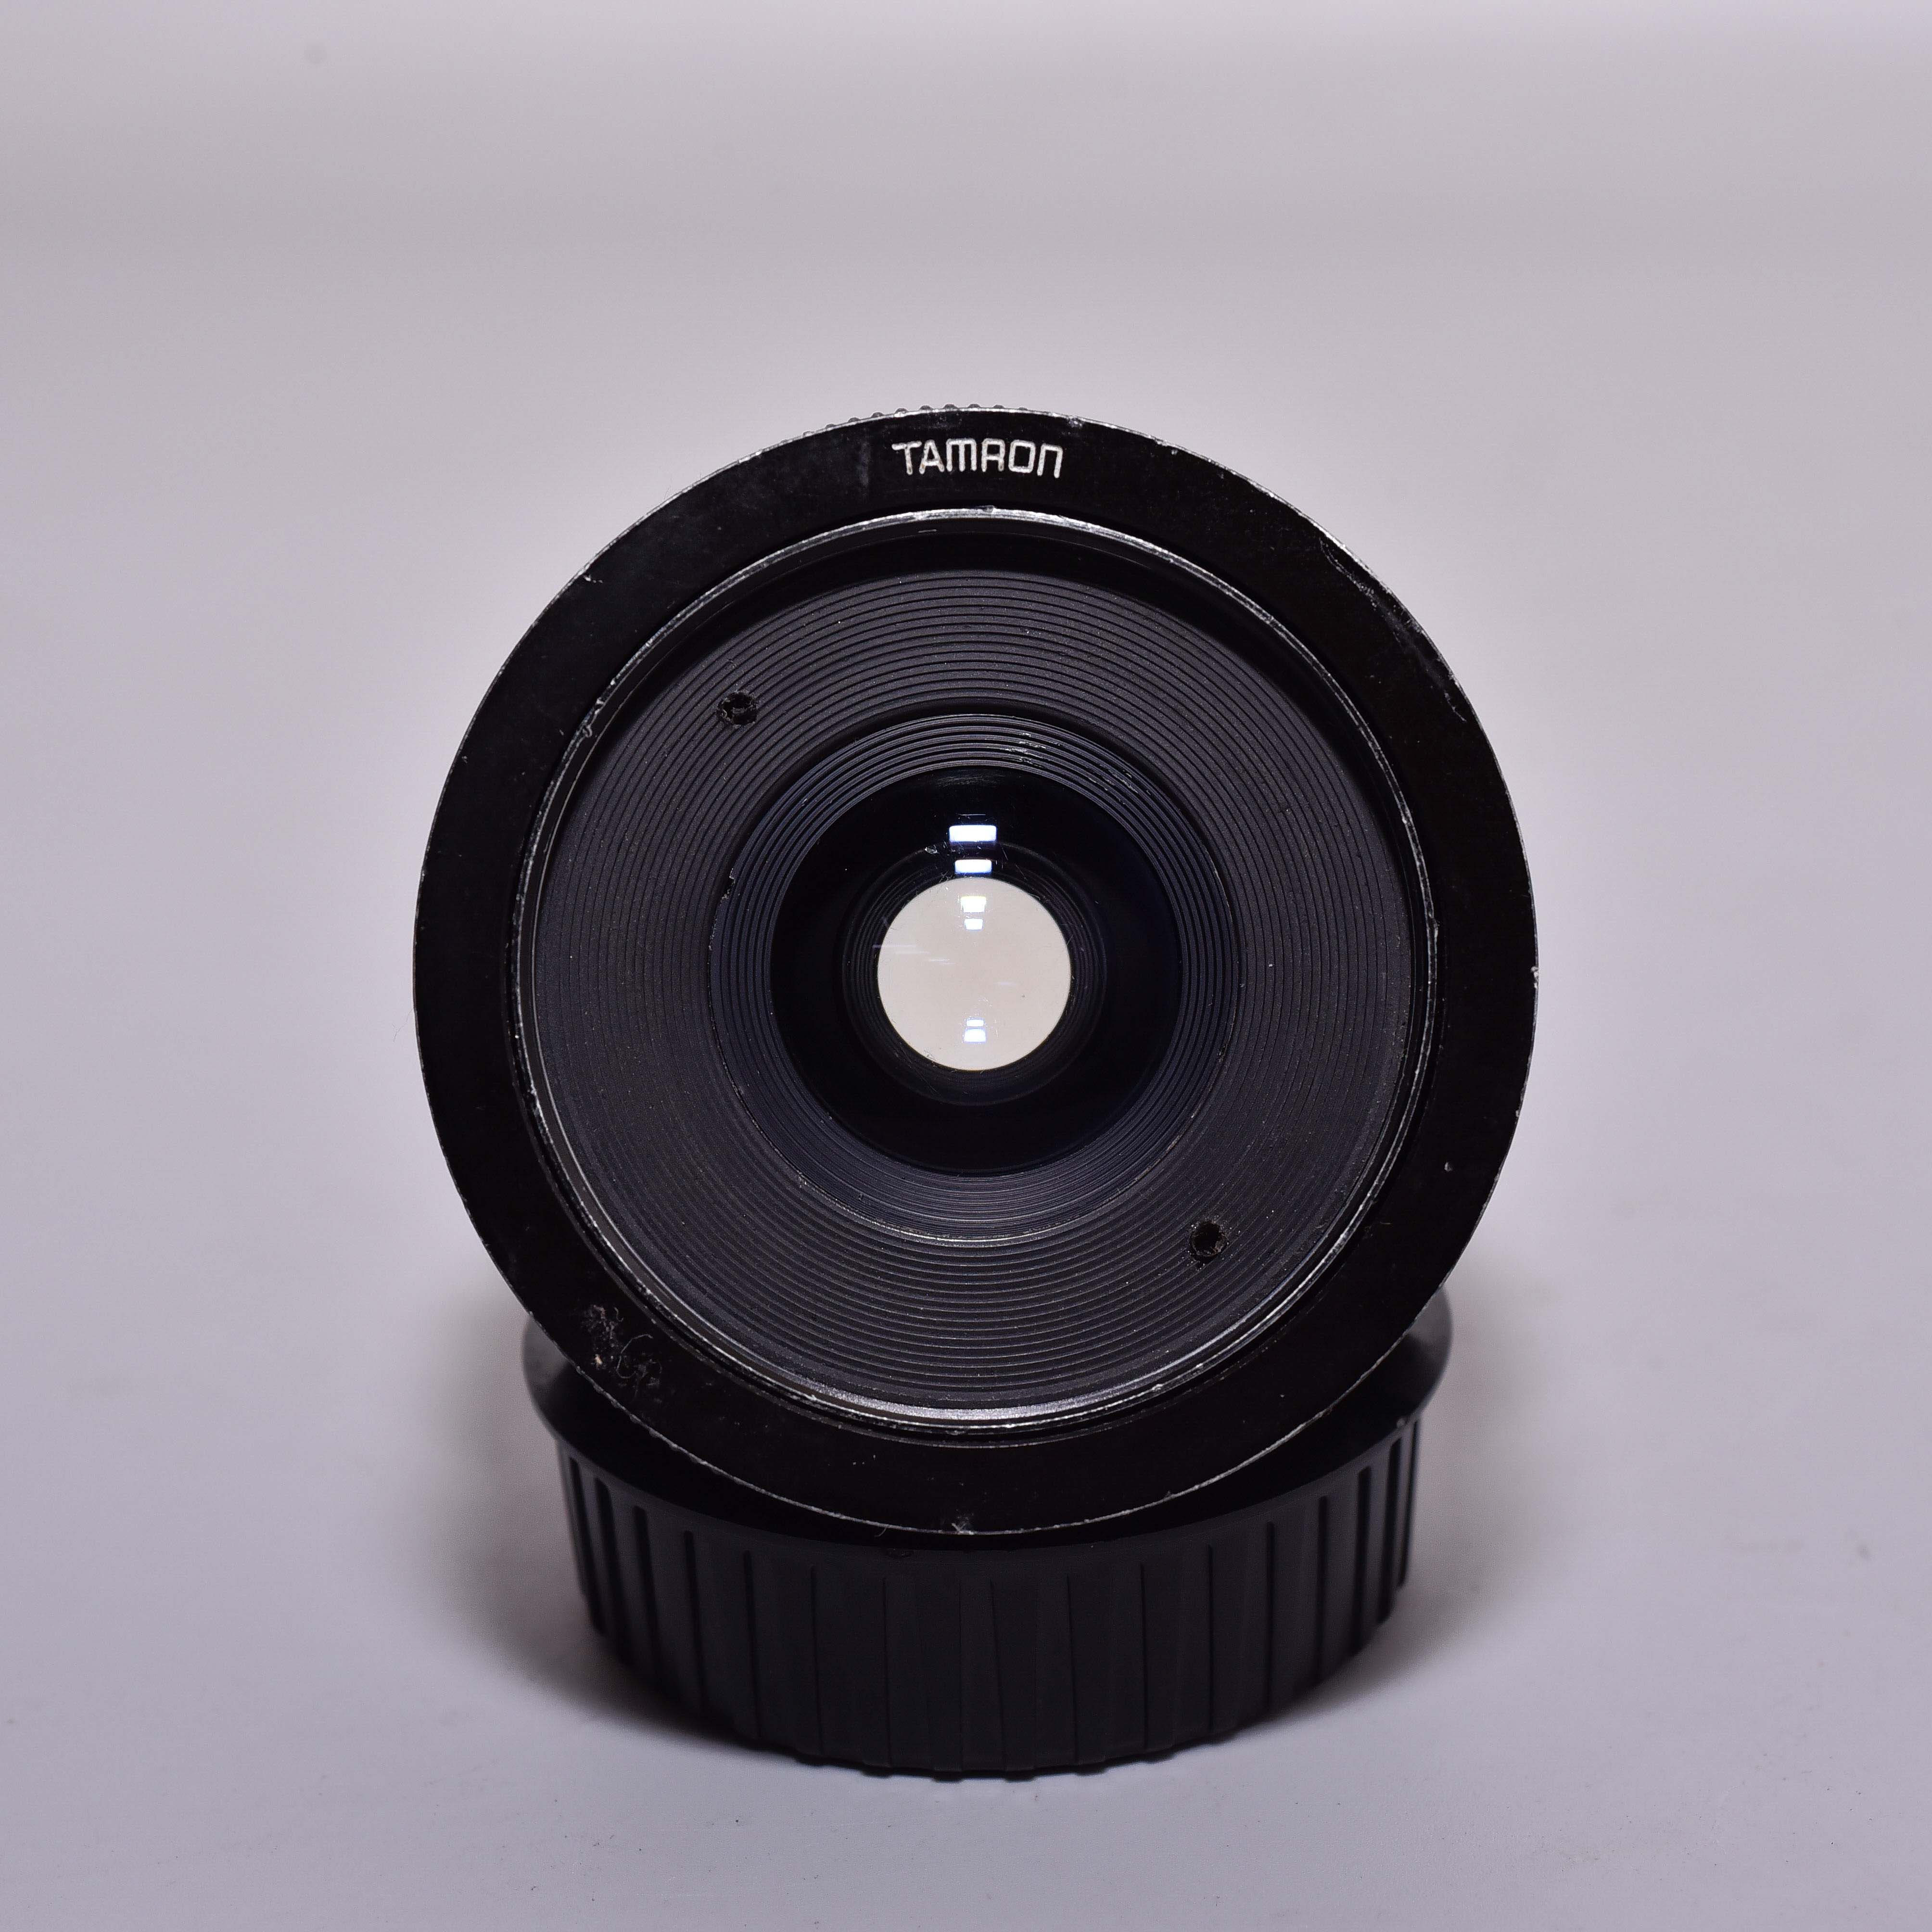 tamron-28mm-f2-5-adaptall-2-28-2-5-11870